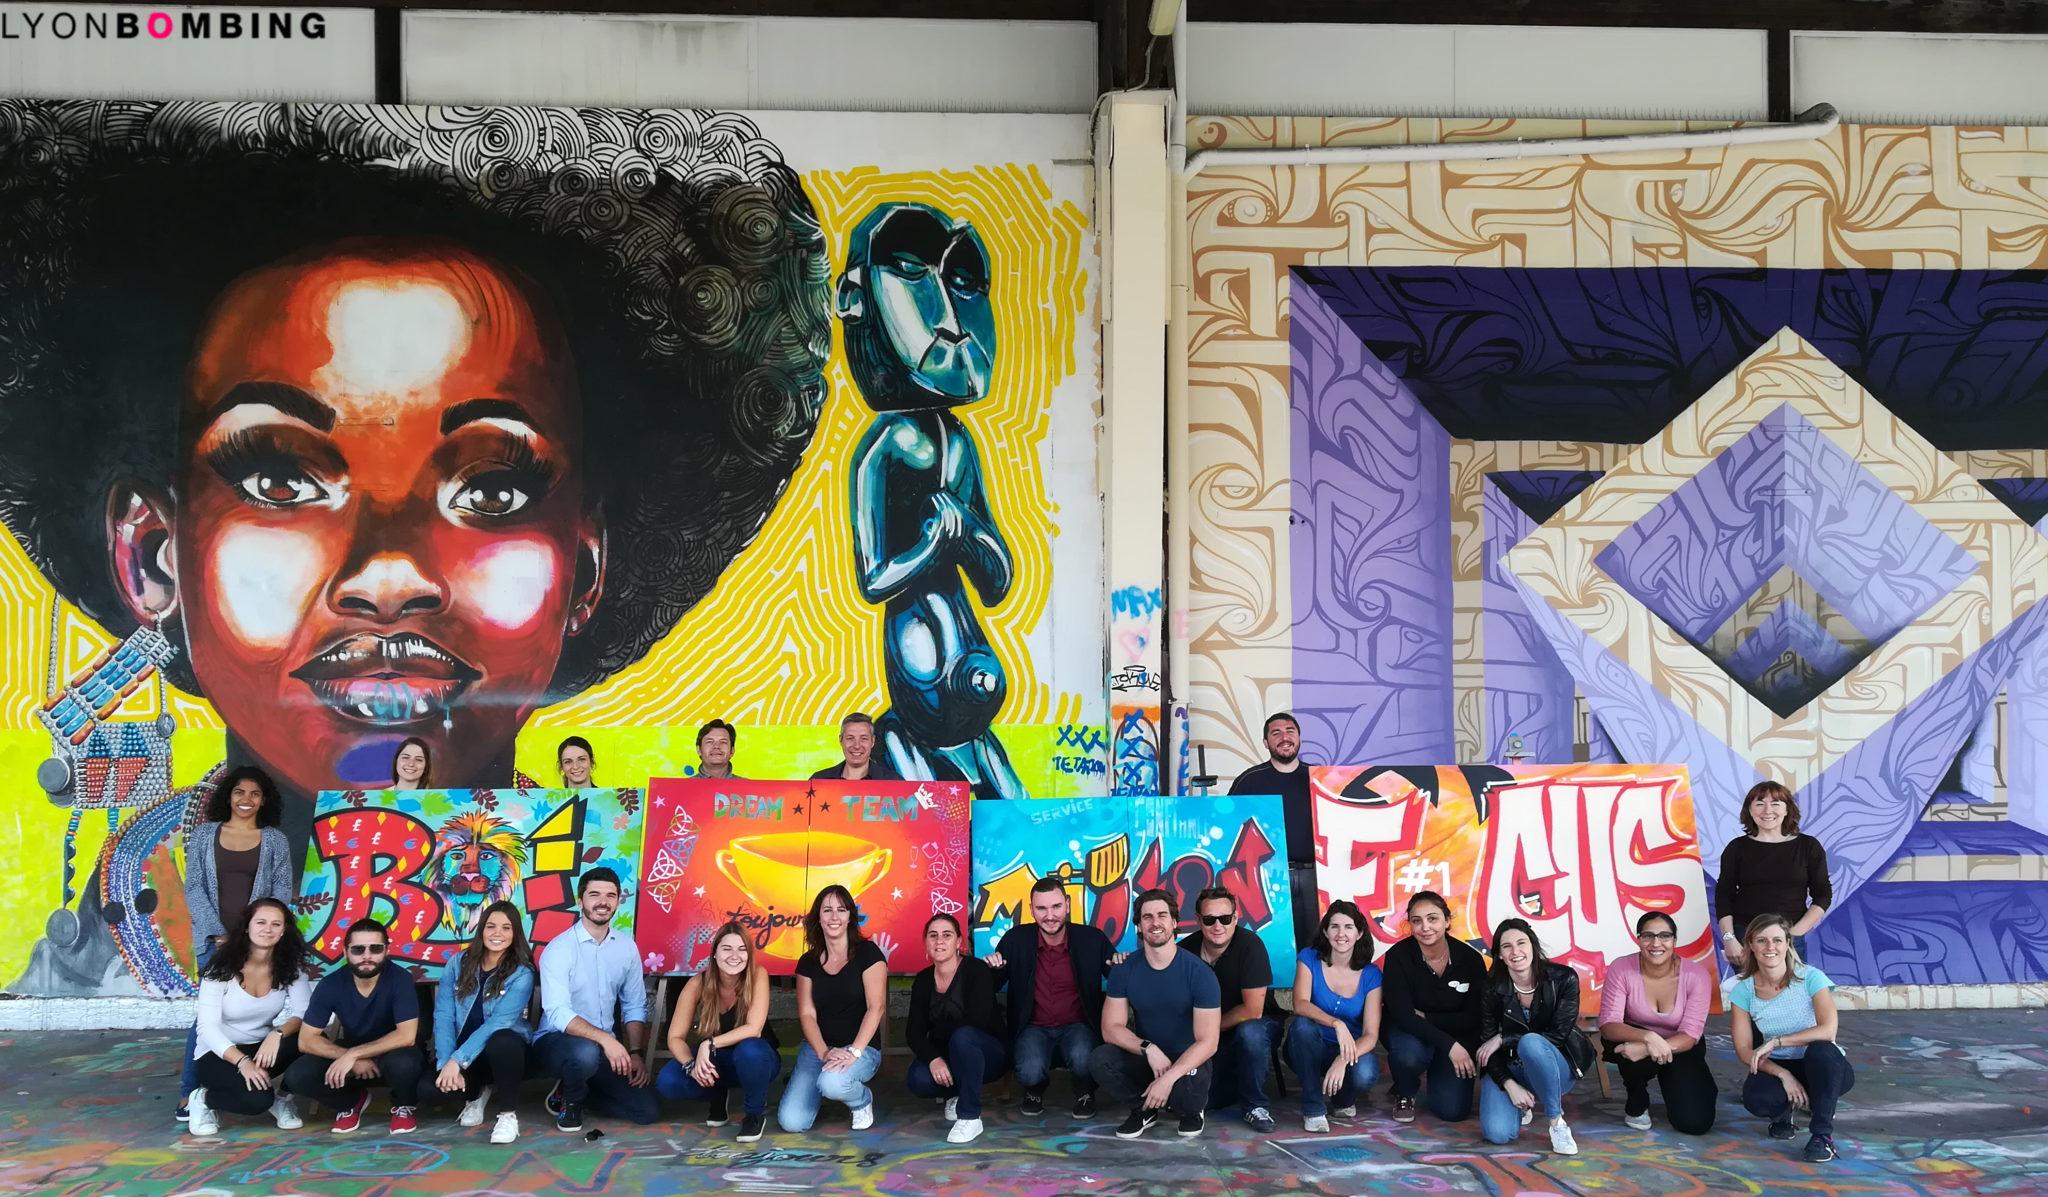 teambuilding-graffiti-aerosol-carglass-streetart-animation